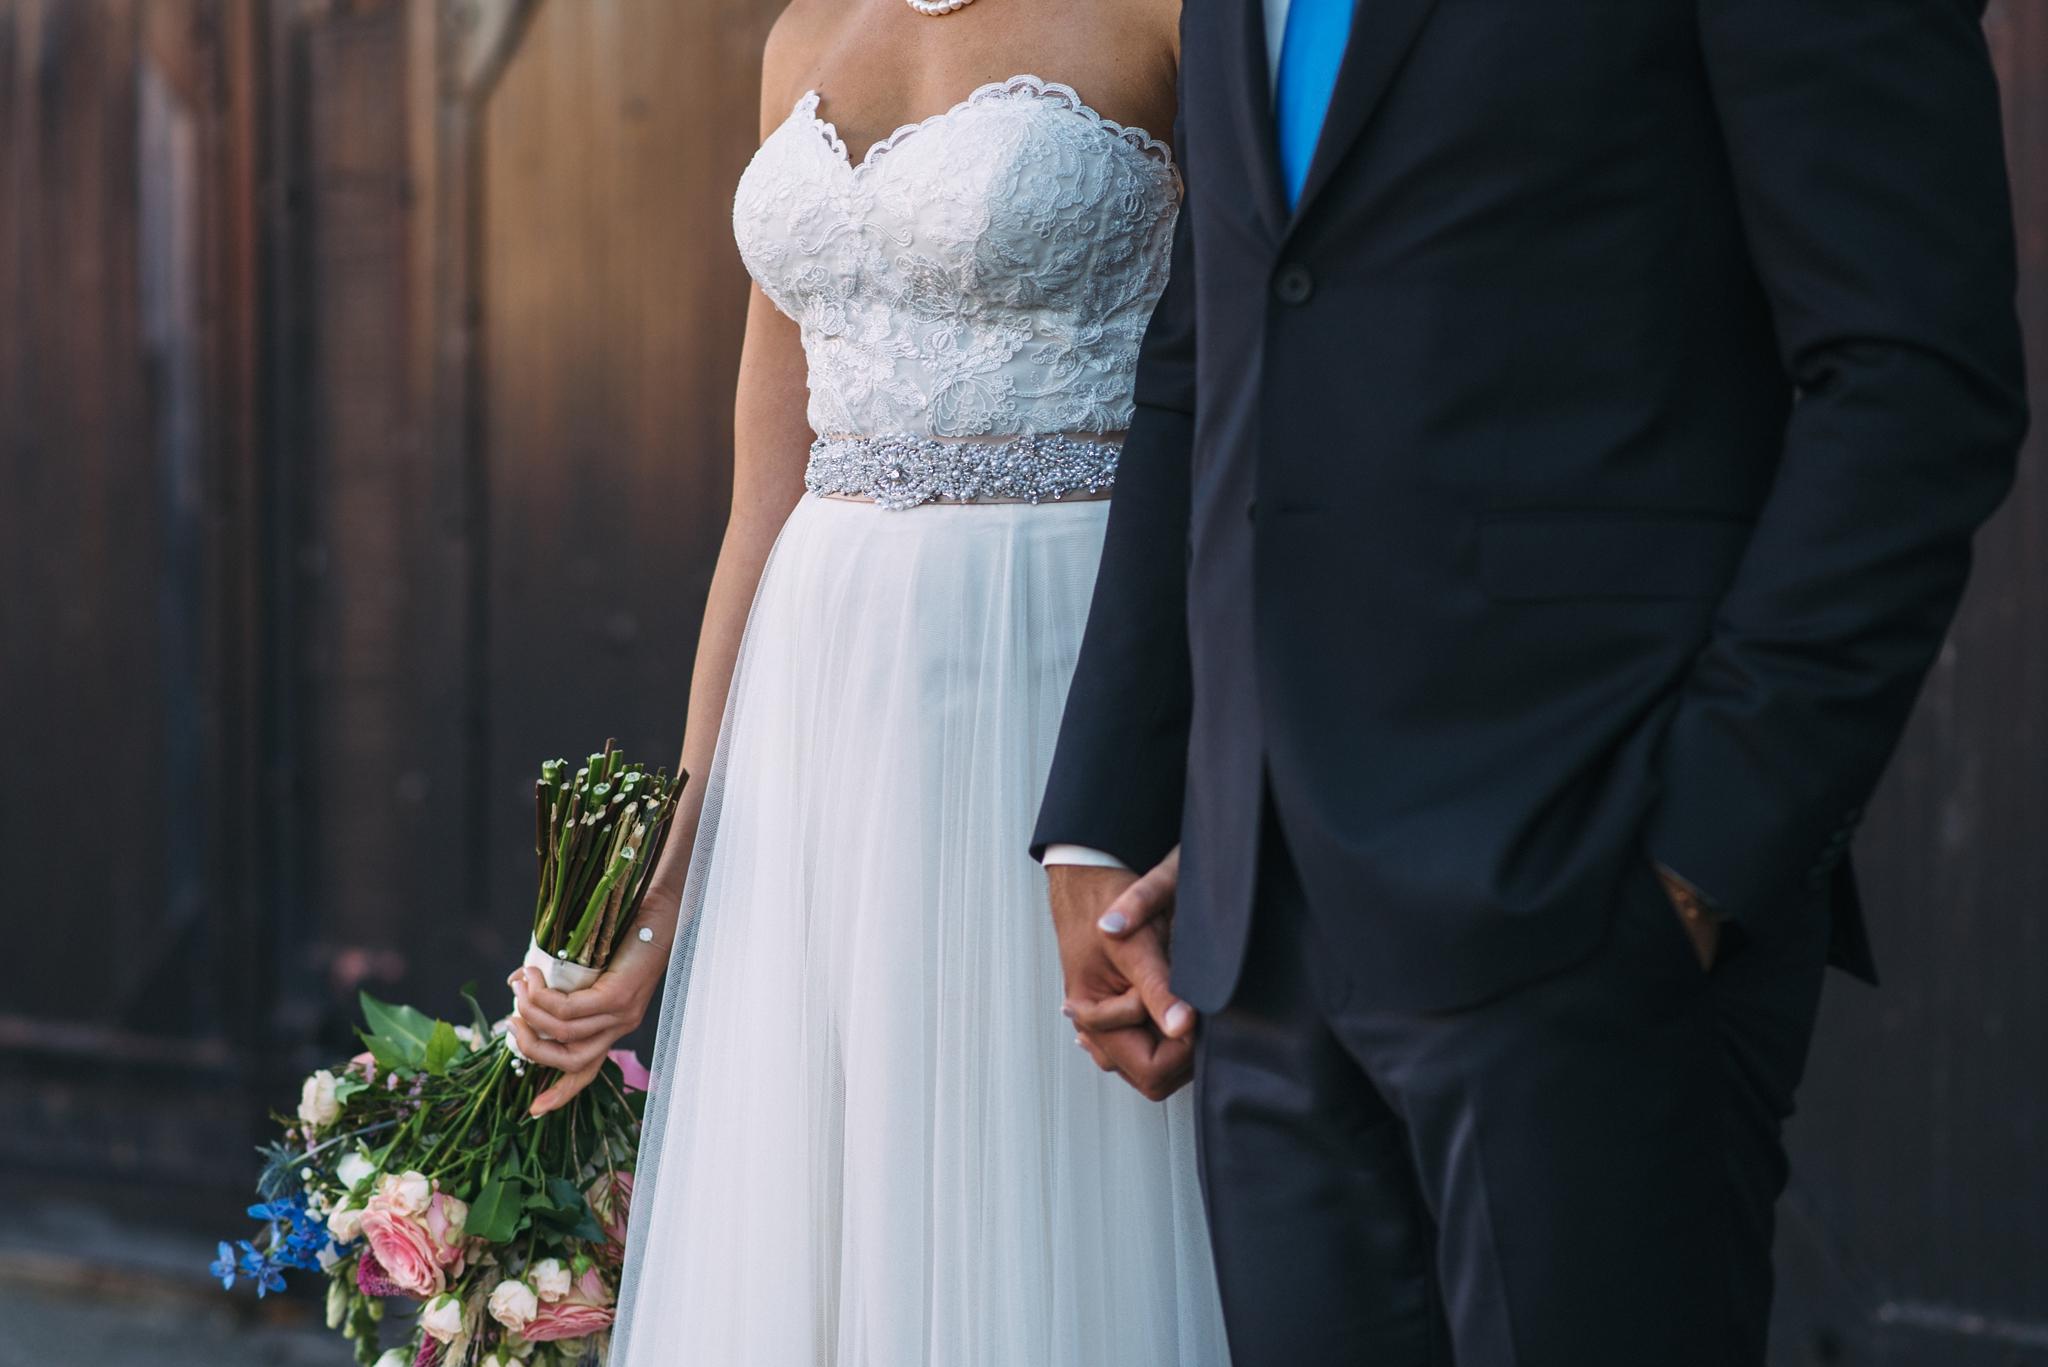 kaihla_tonai_intimate_wedding_elopement_photographer_2895